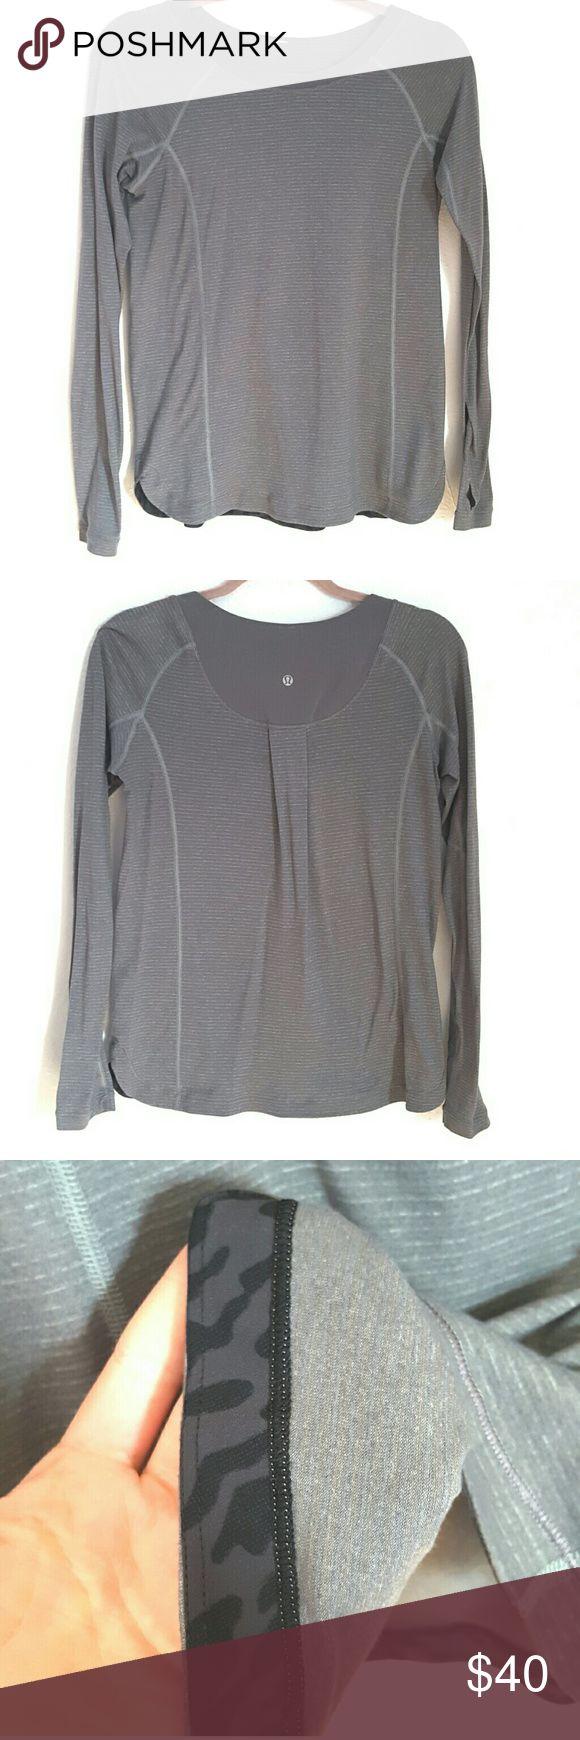 Lululemon Grey Long Sleeve Top EUC. Lululemon grey long sleeve top. Size tag is cutout, but it's a size 6. lululemon athletica Tops Tees - Long Sleeve